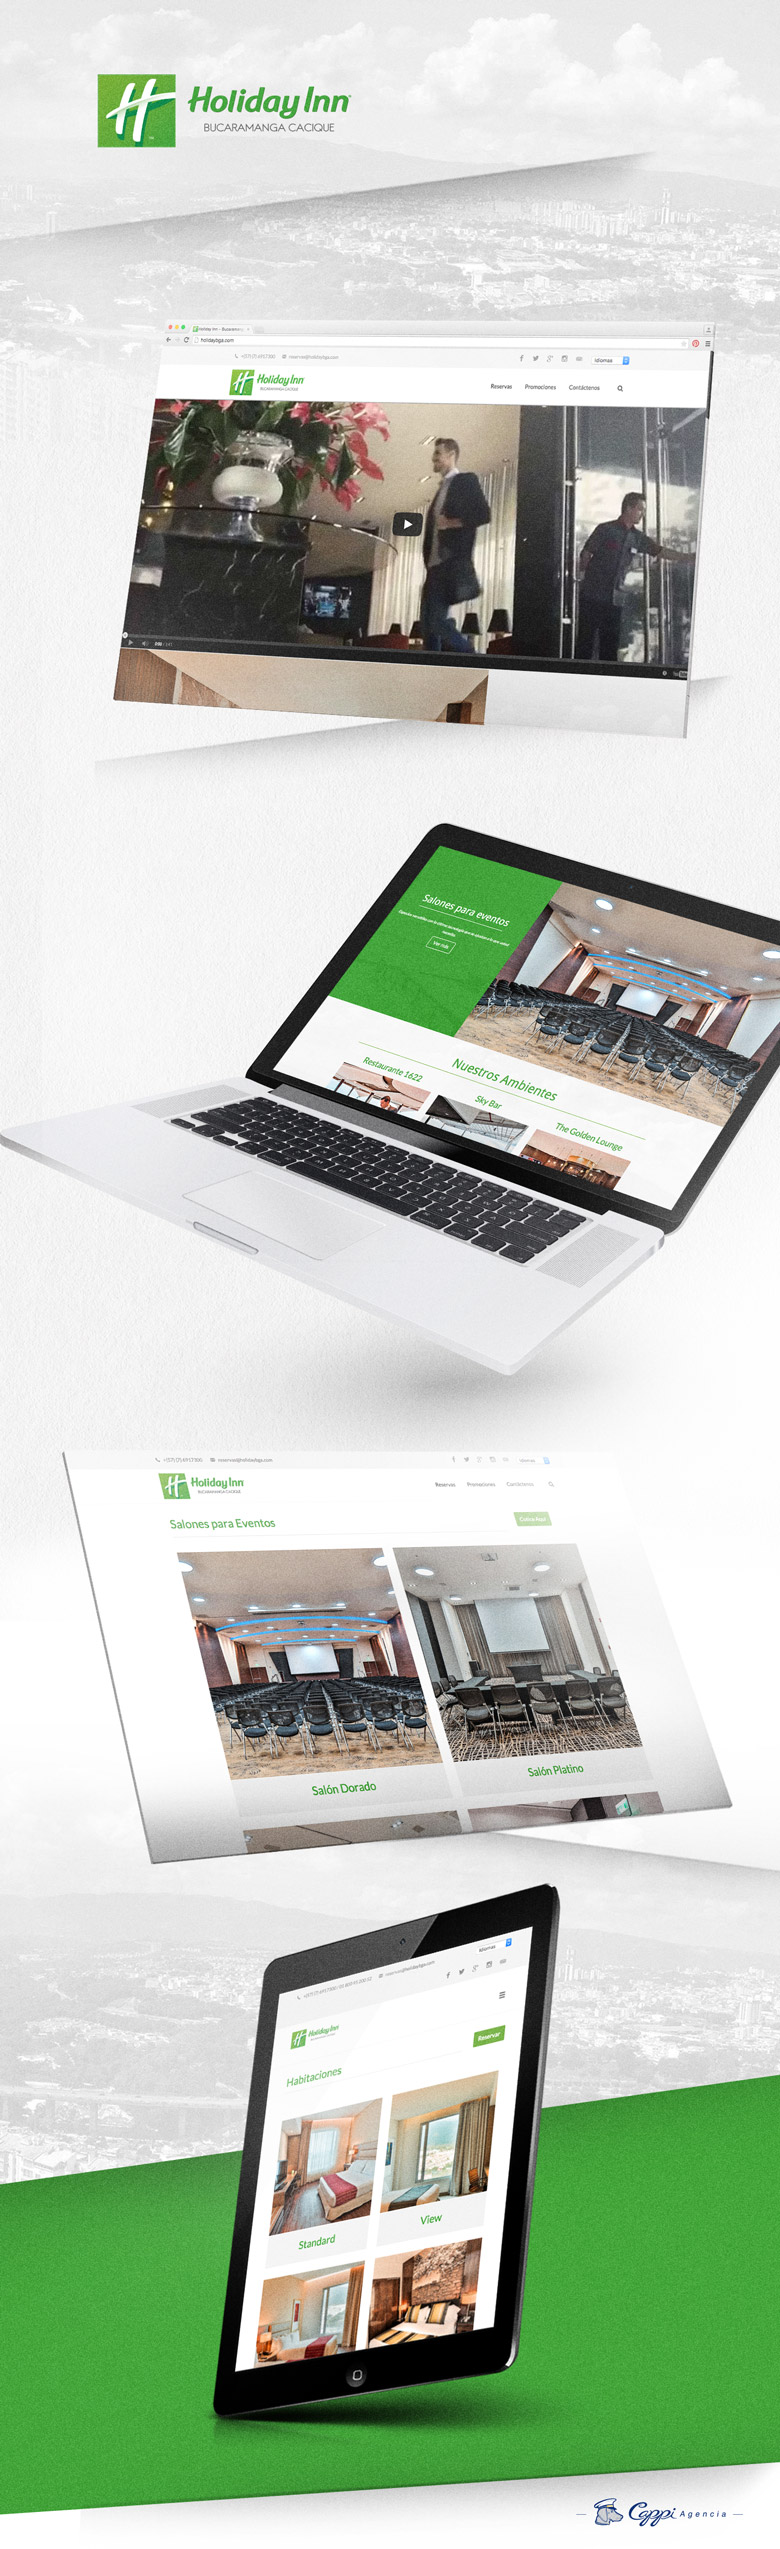 Página web holida inn bucaramanga